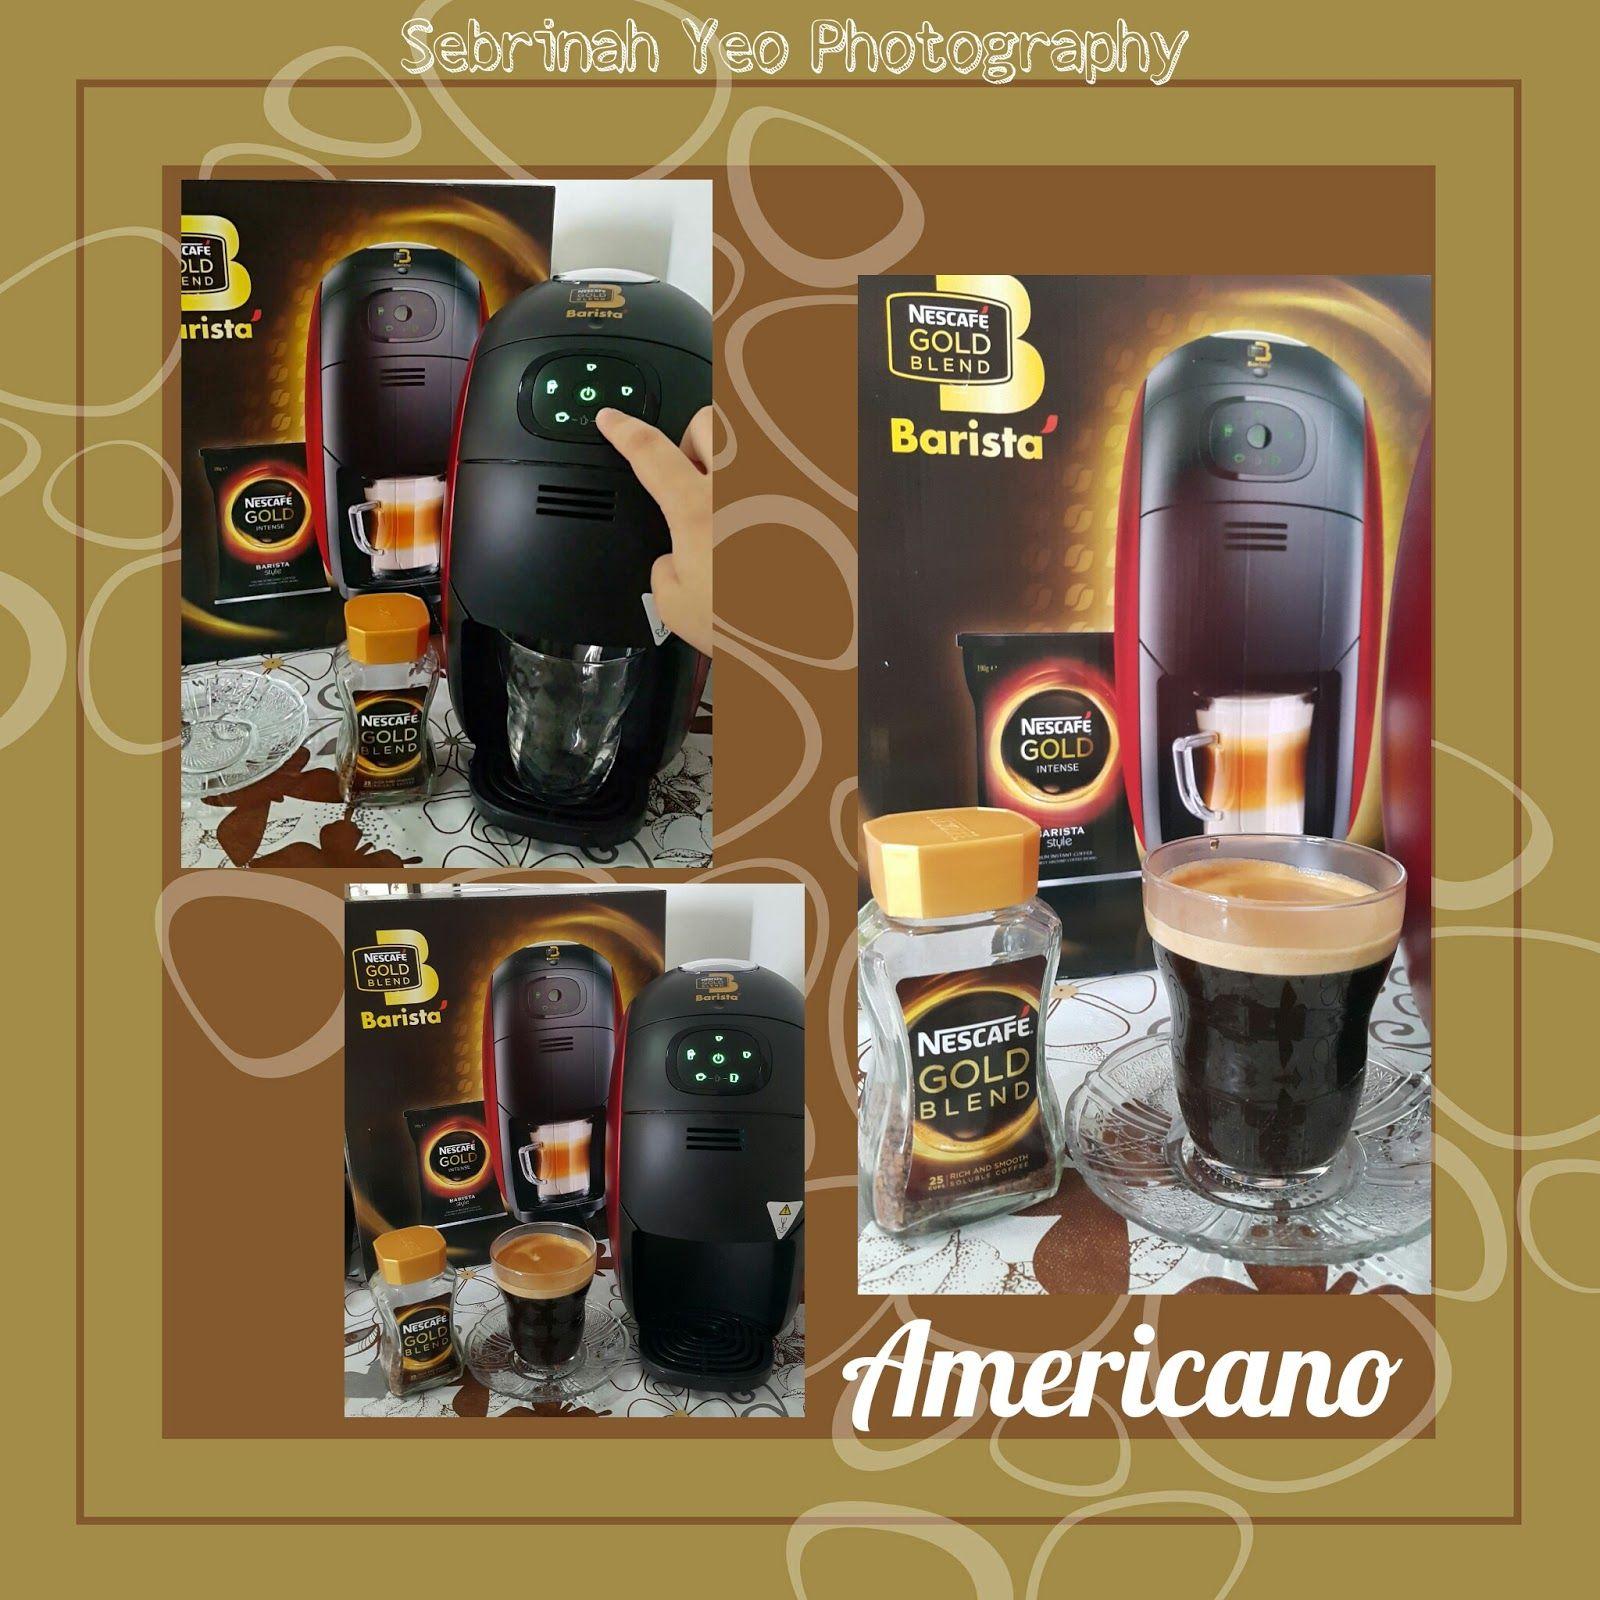 NESCAFE Gold Blend Barista Machine Malaysia Review